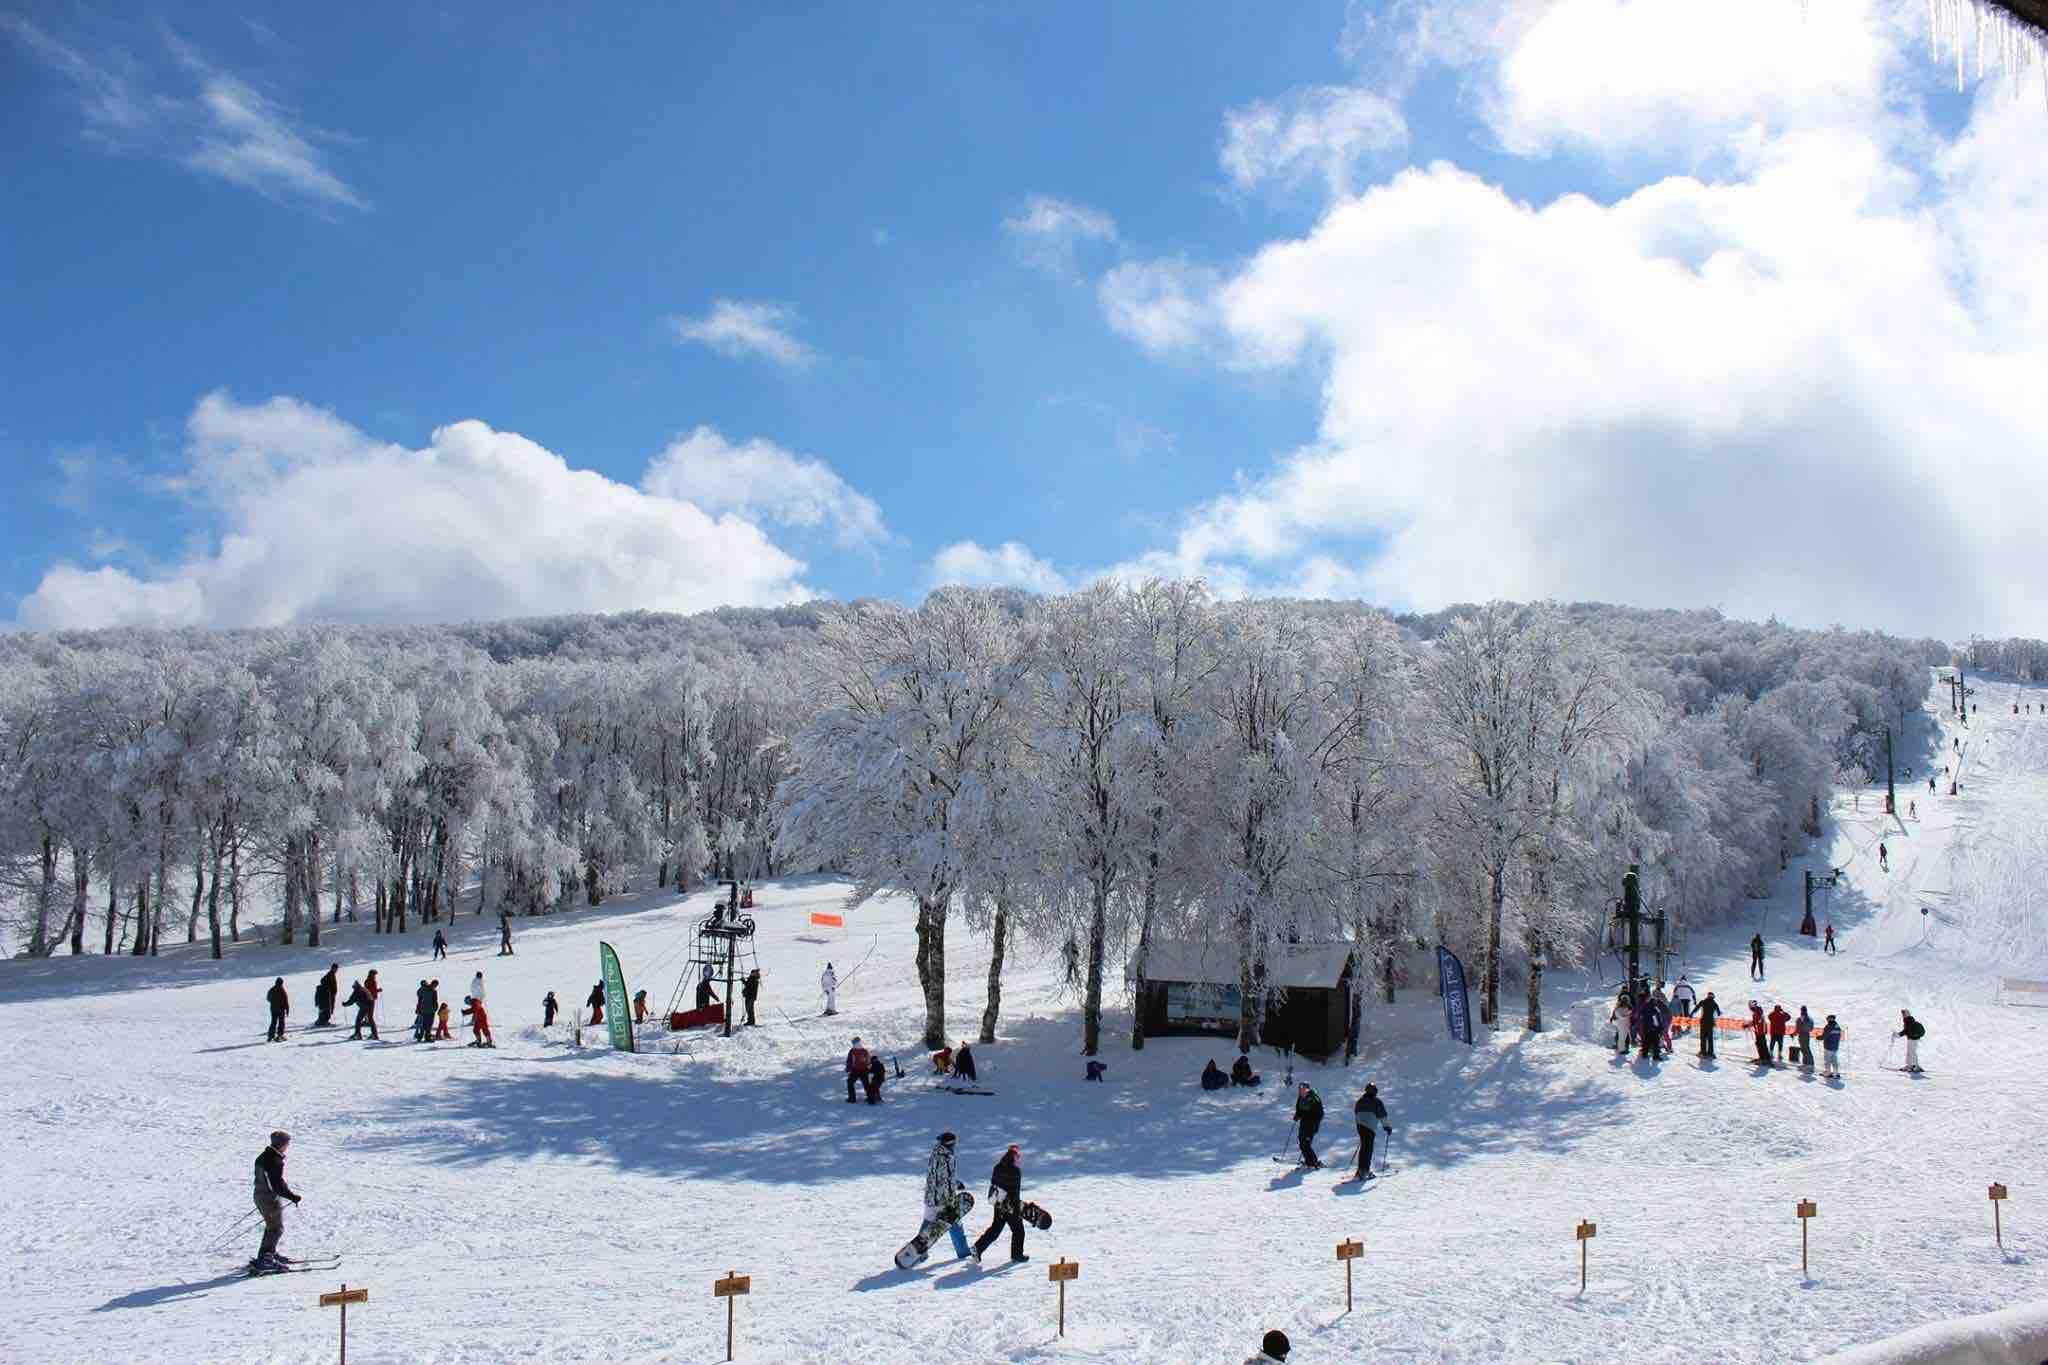 Laguiole ski resort